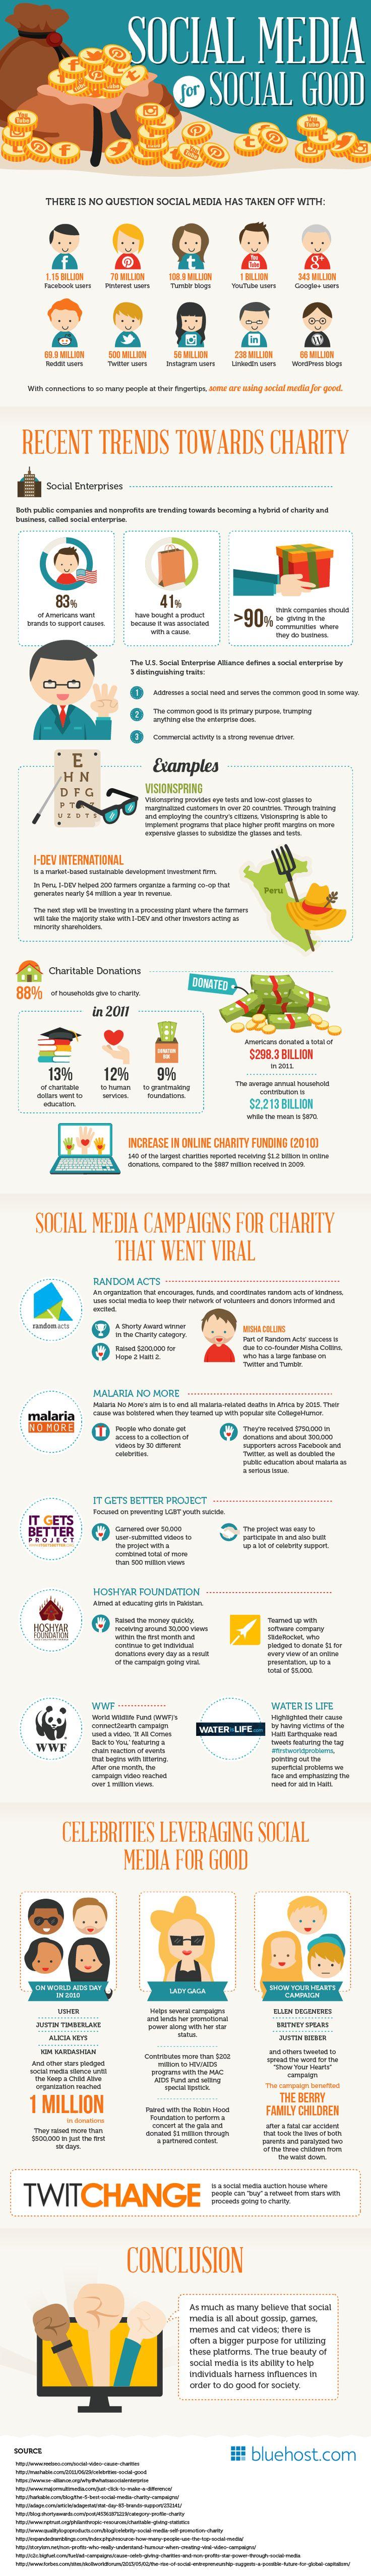 Social Media For Social Good #Infographic #SocialMedia